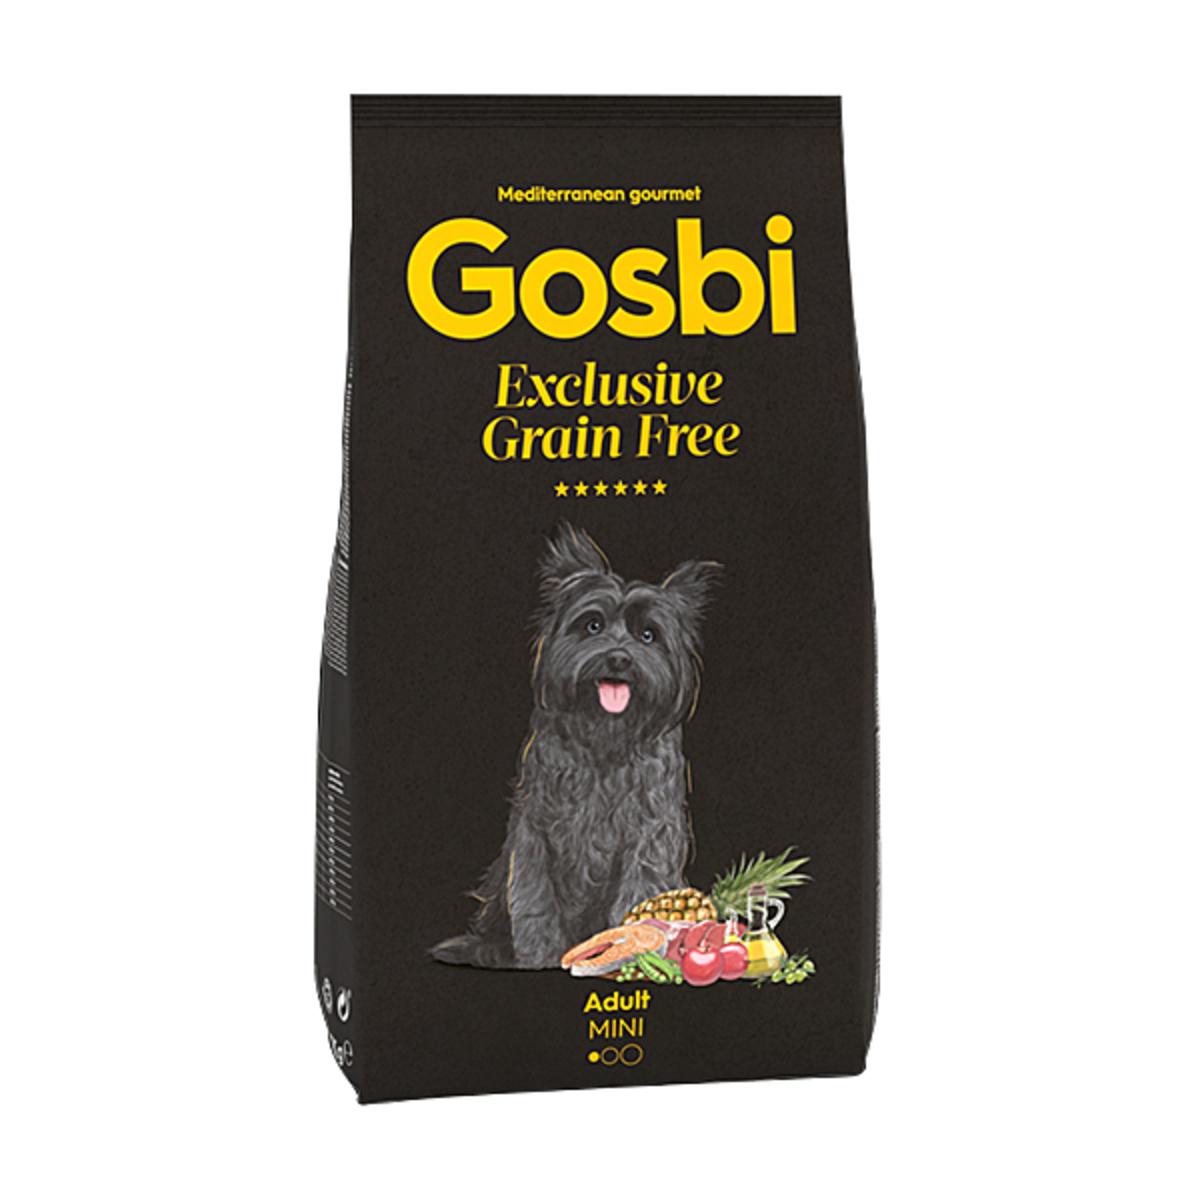 Exclusive Grain Free Adult Mini - 2kg